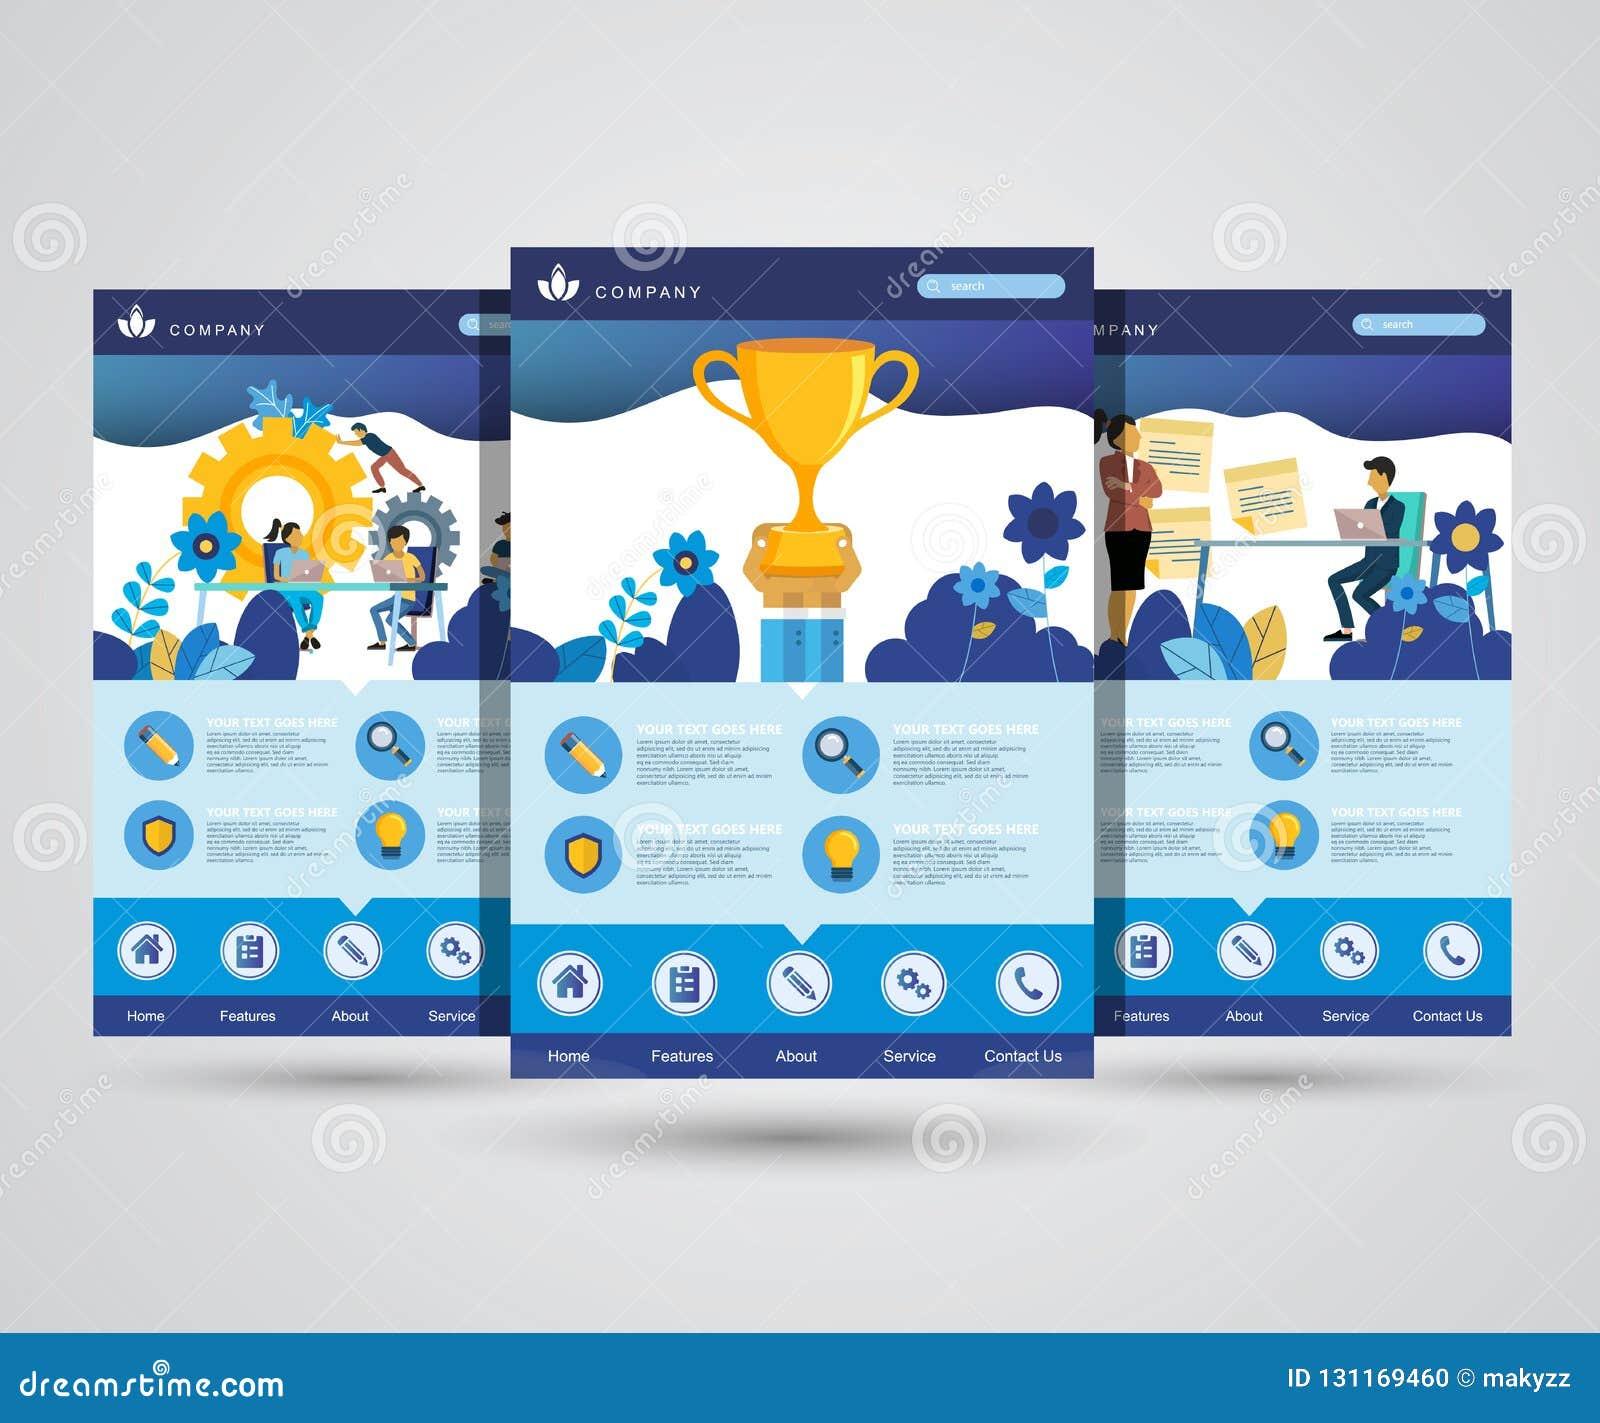 web development company business plan